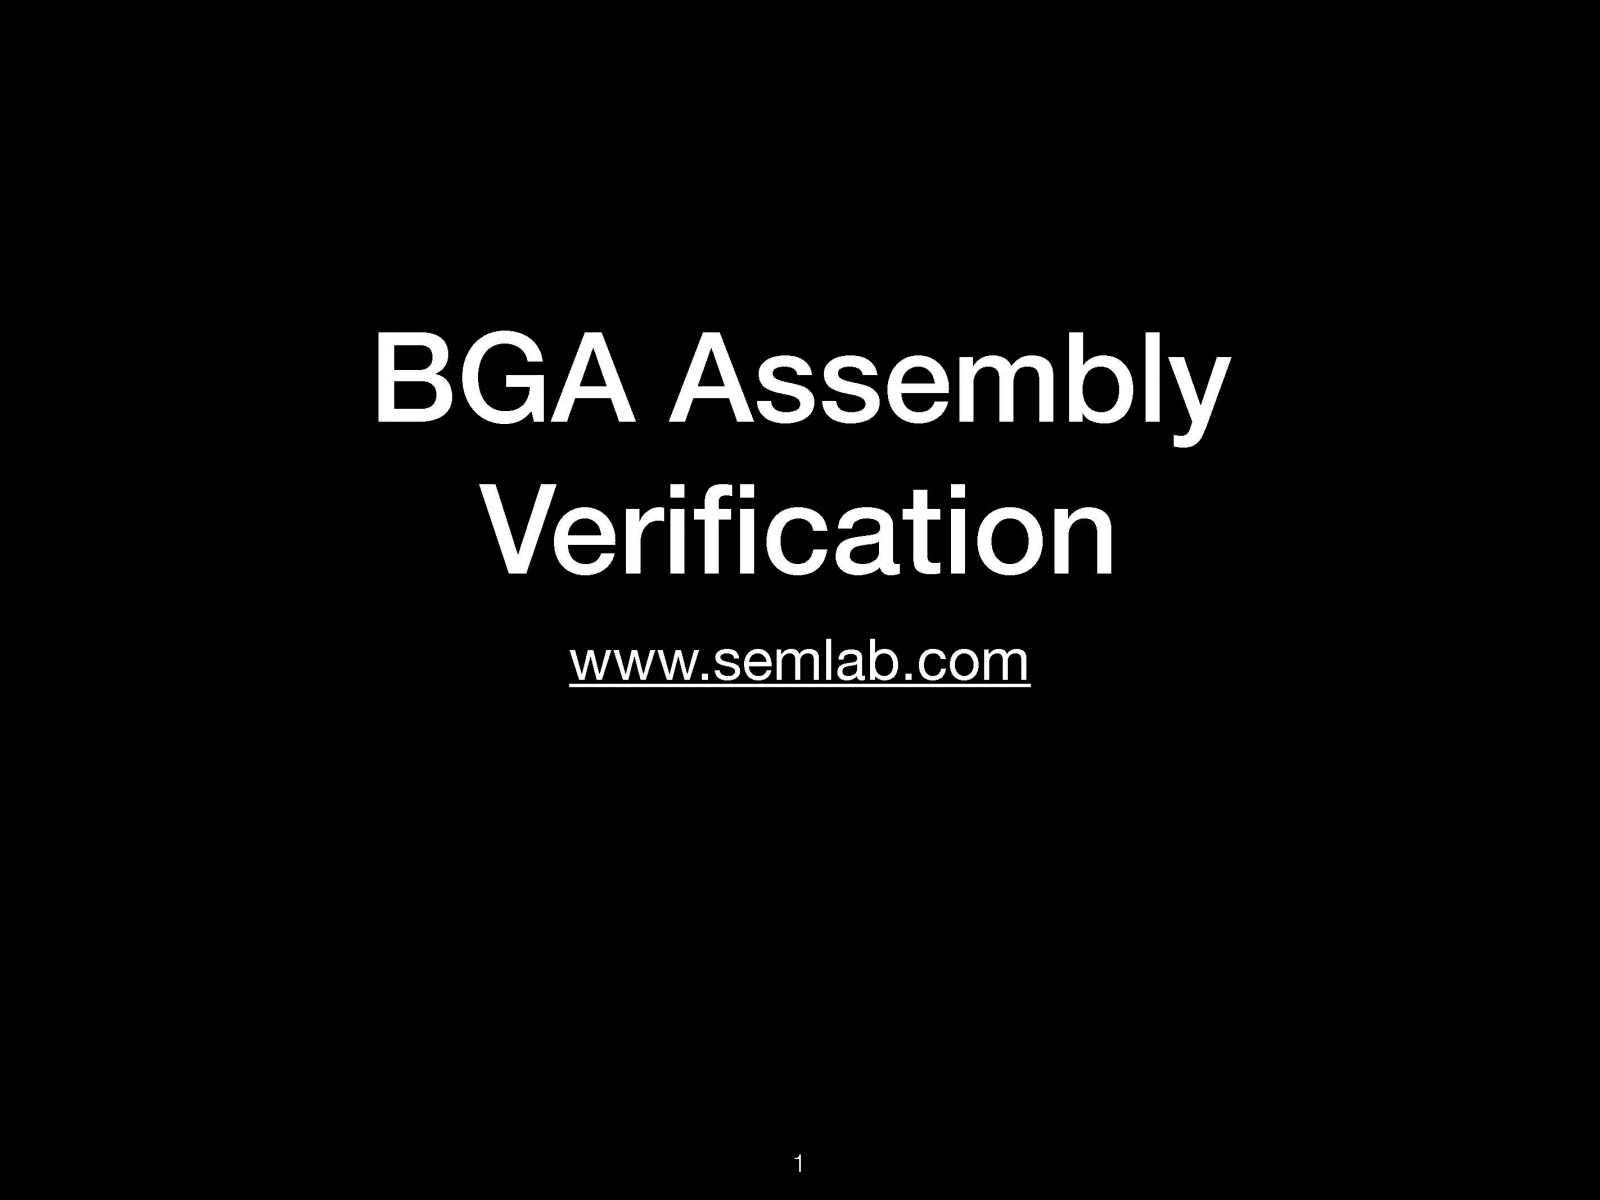 BGAAssemblyVerification_Page_1